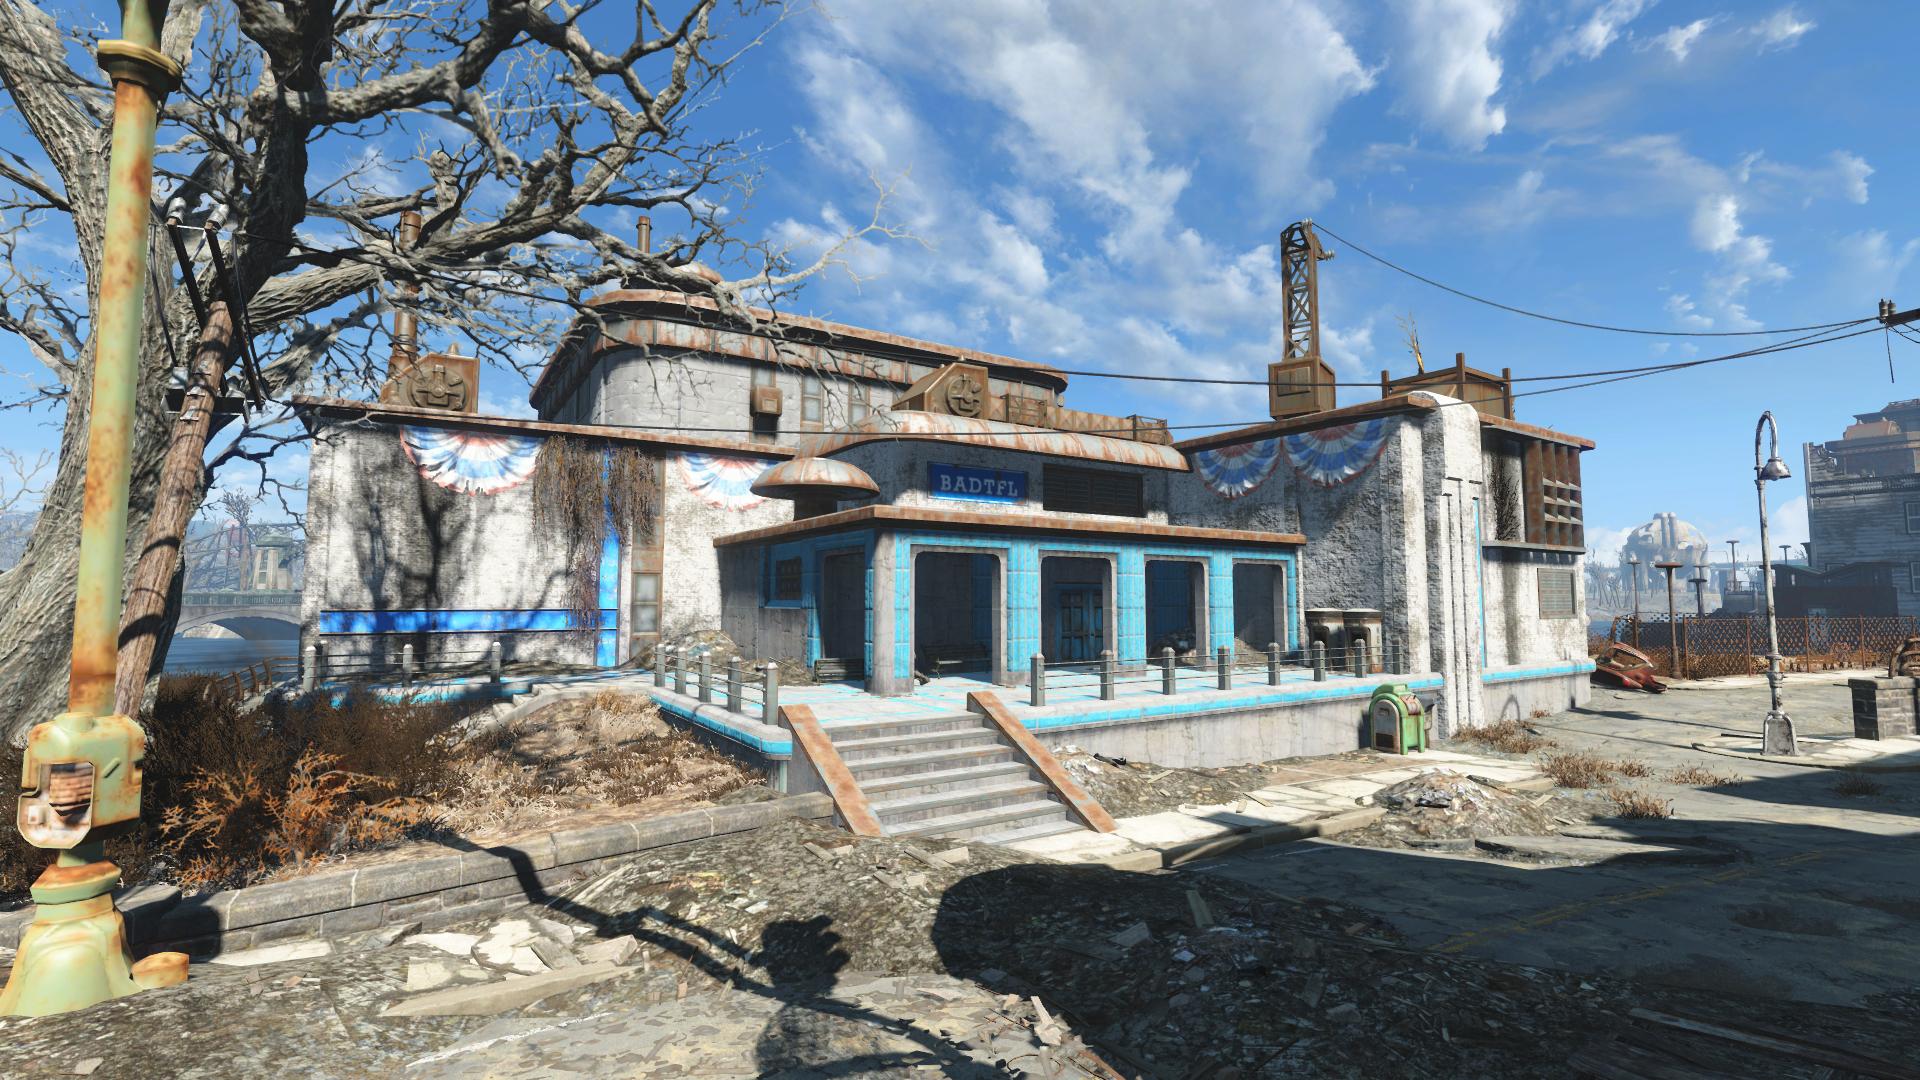 BADTFL regional office | Fallout Wiki | FANDOM powered by Wikia